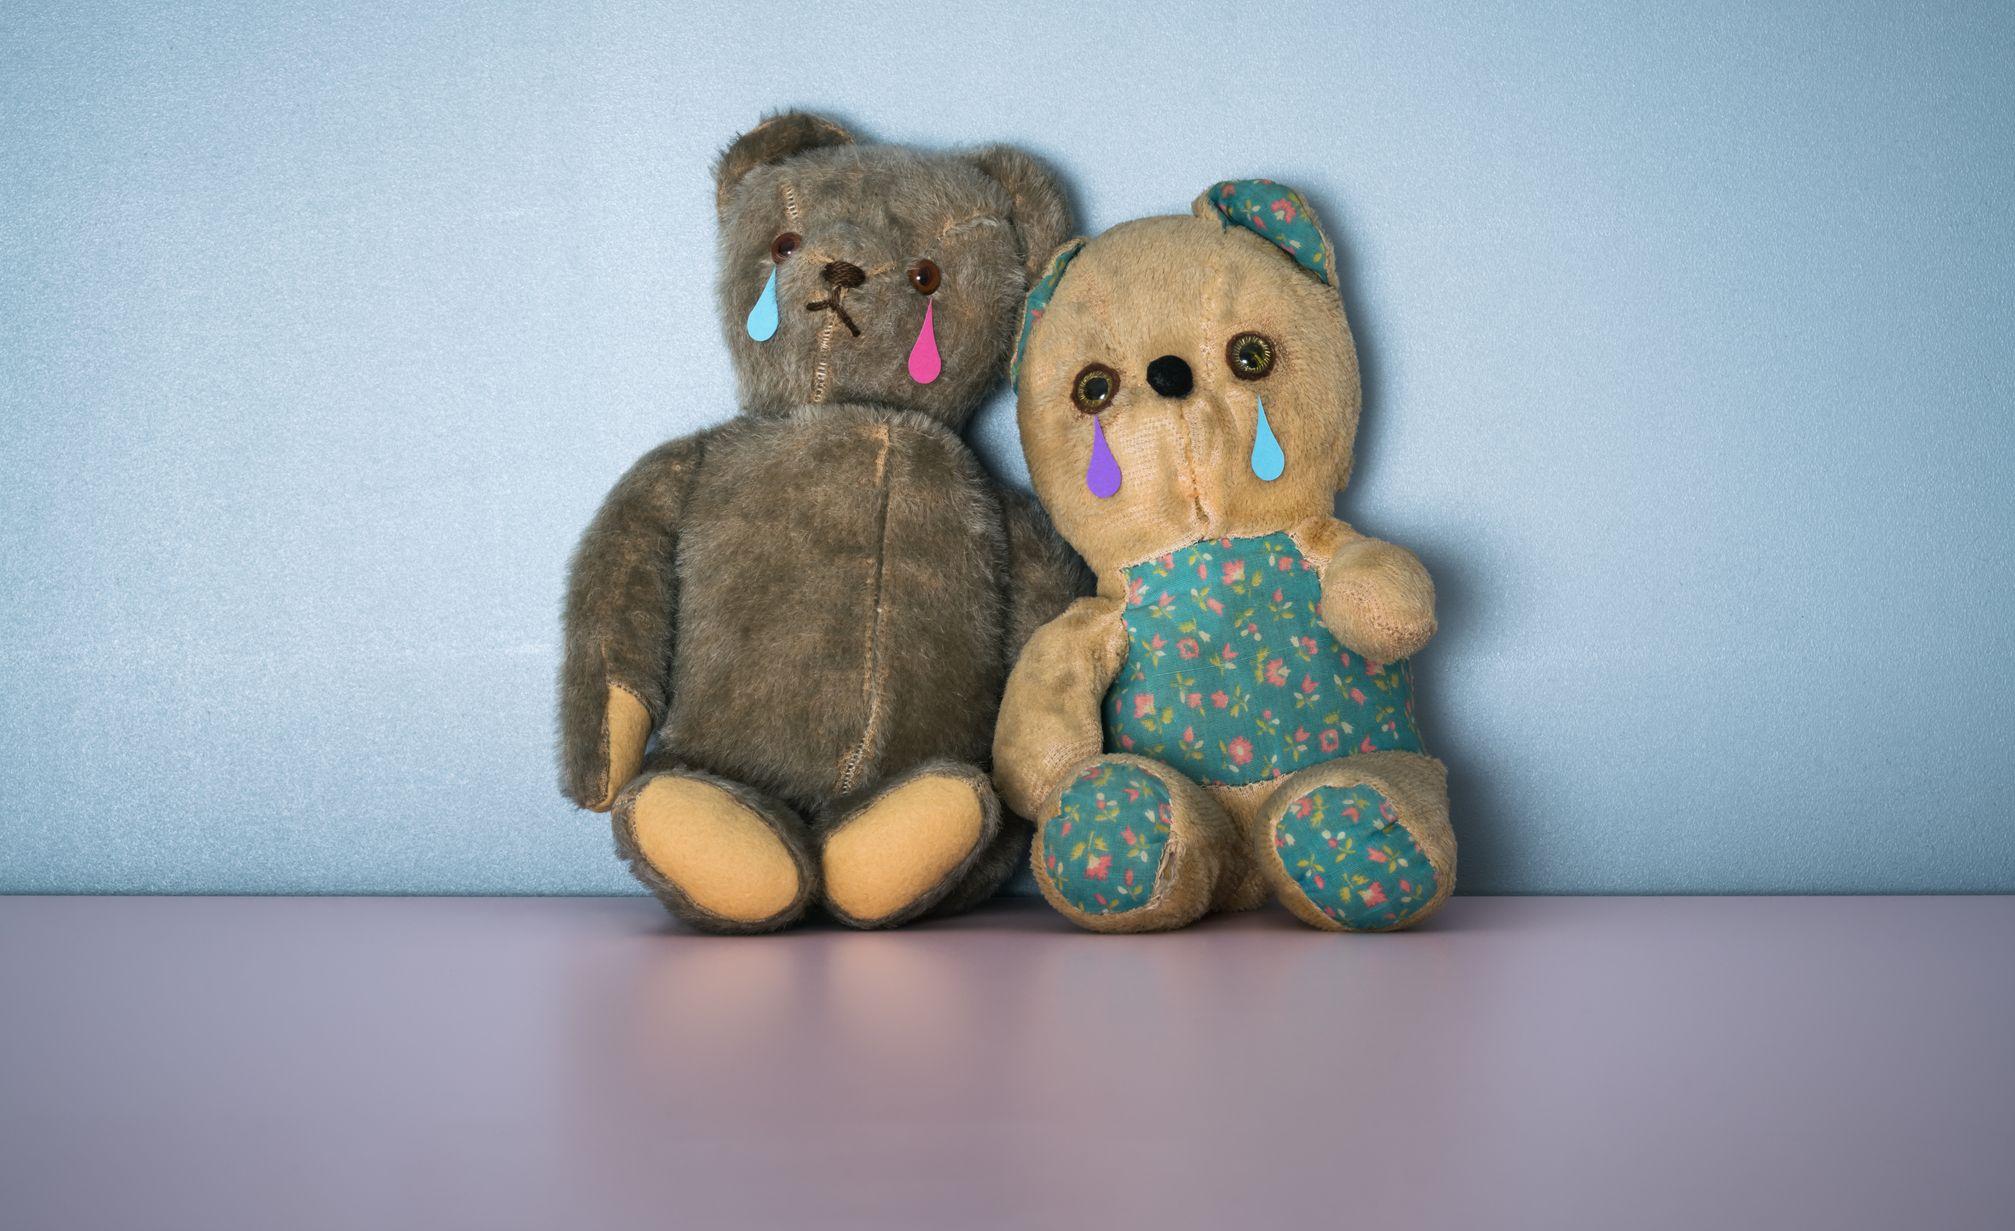 Two sad teddy bears